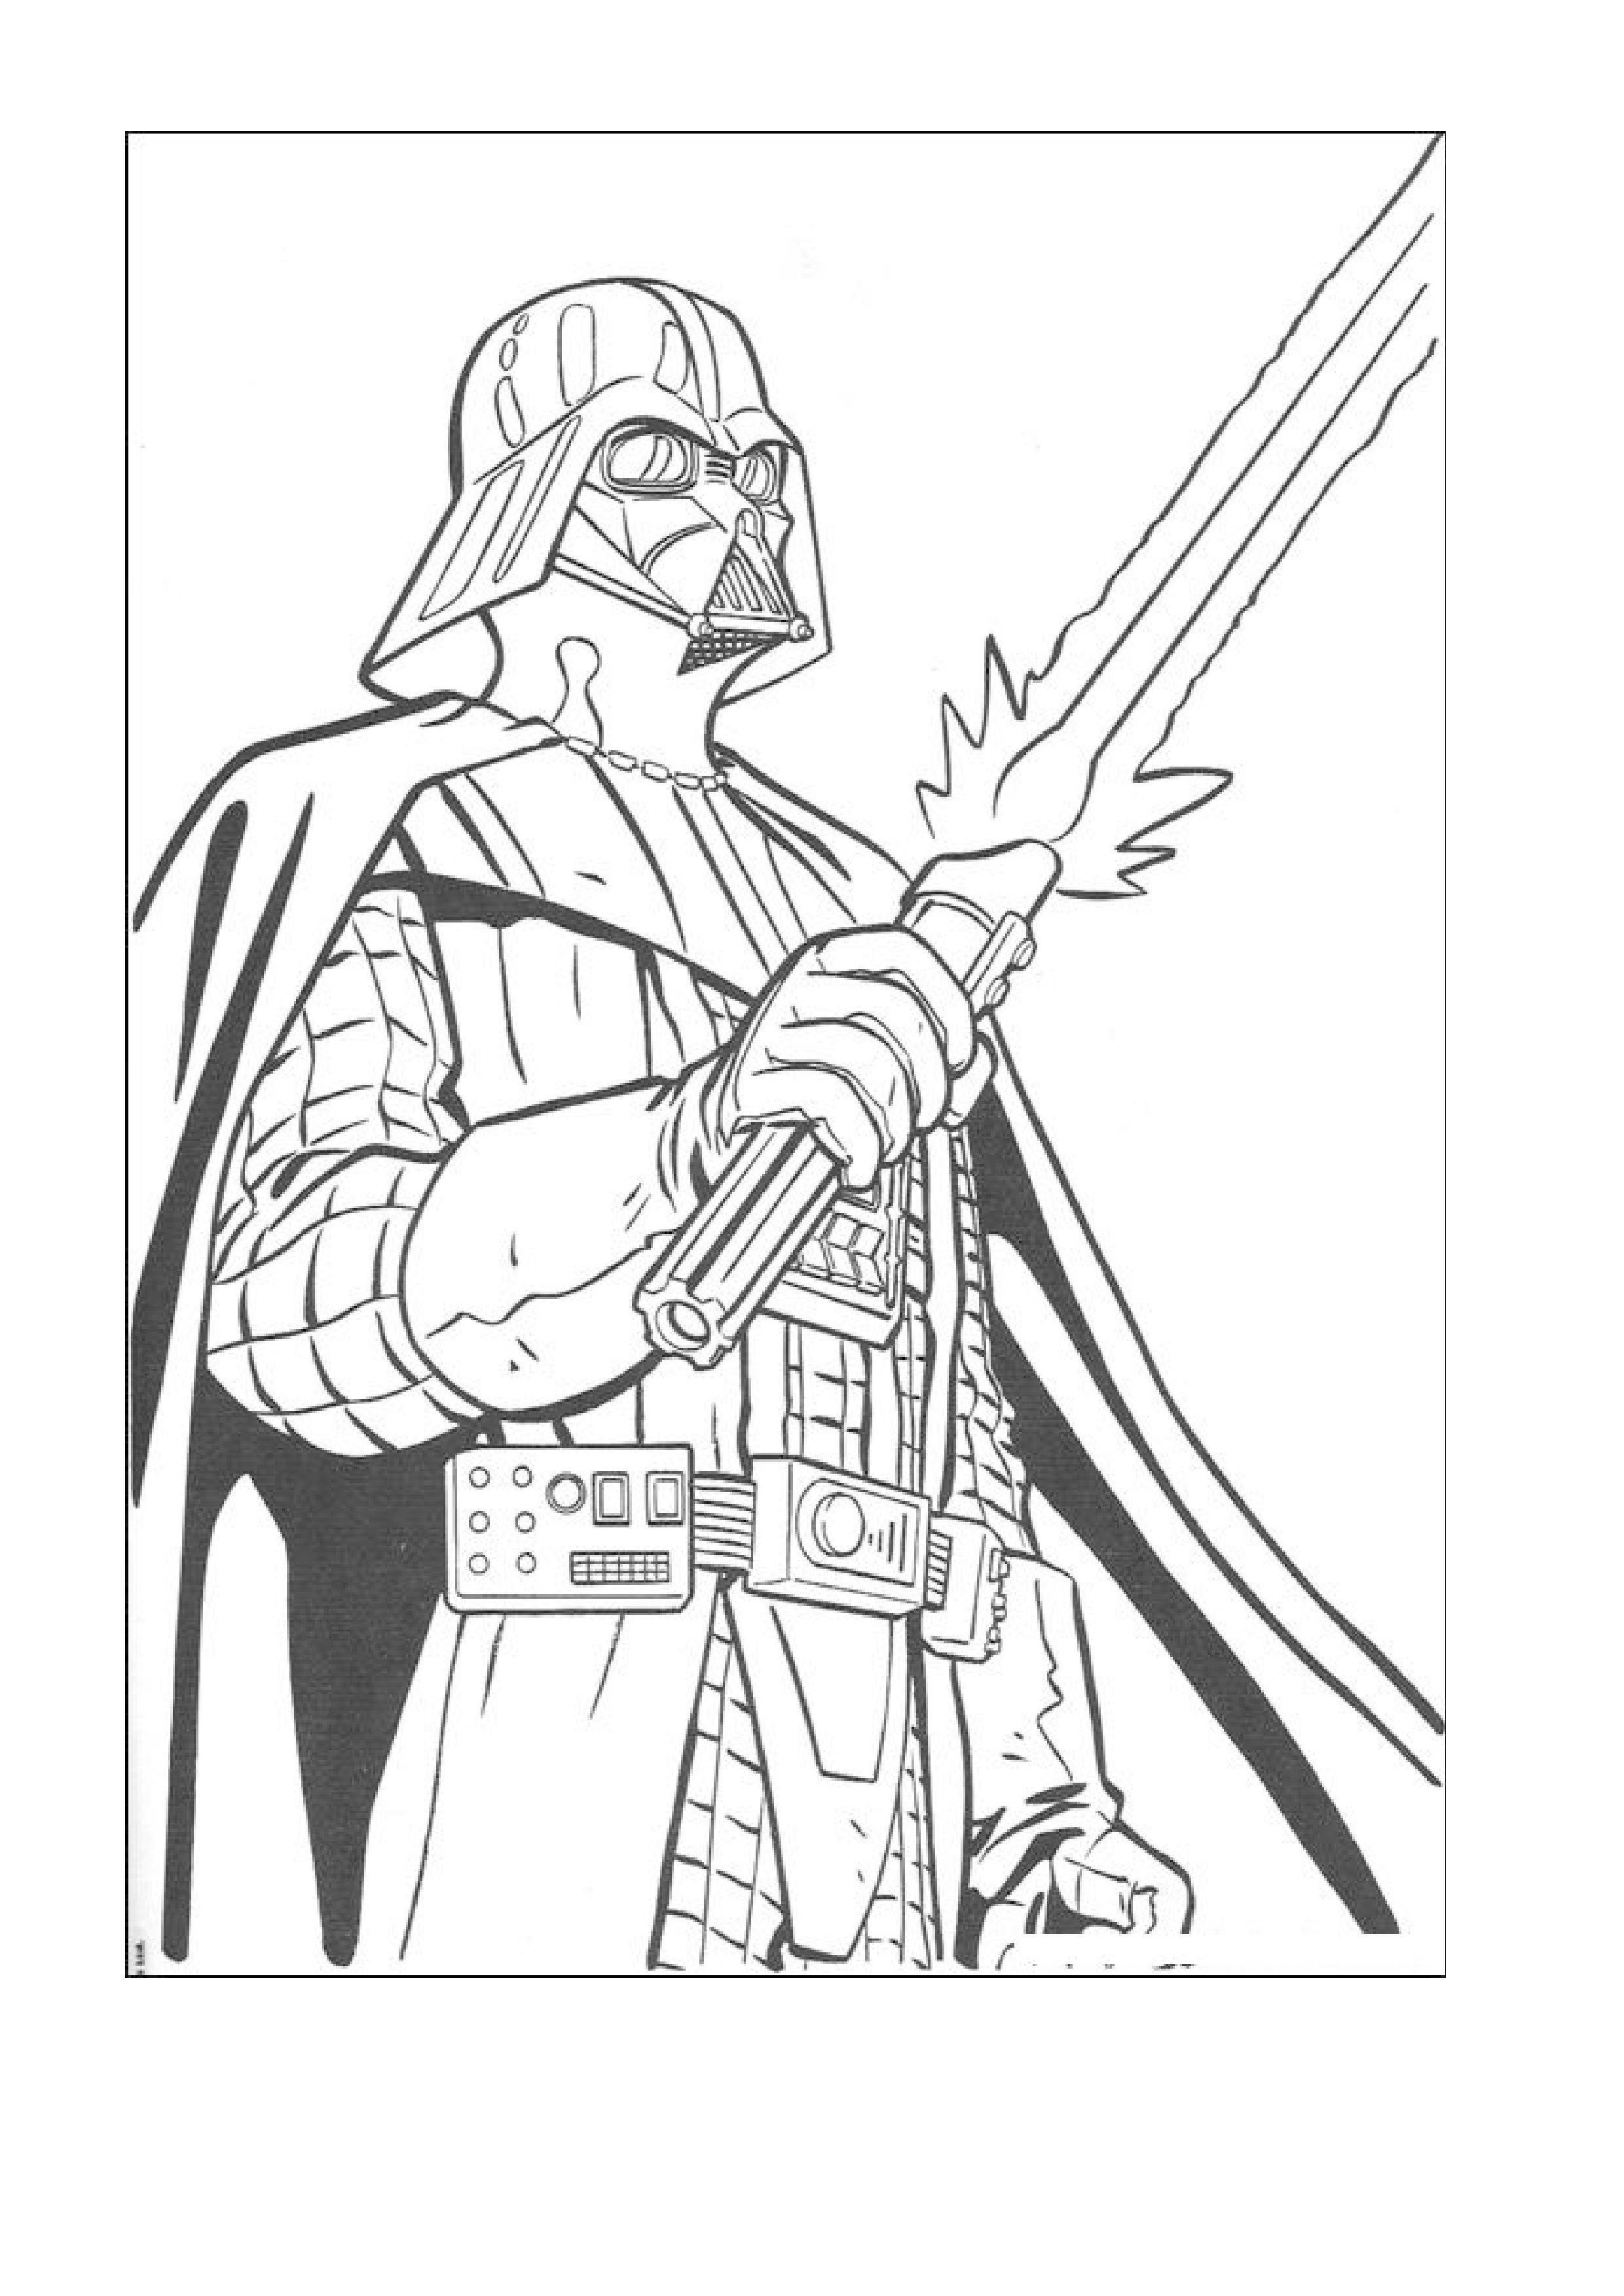 2480x3507 Lego Star Wars Darth Vader Coloring Pages Acpra